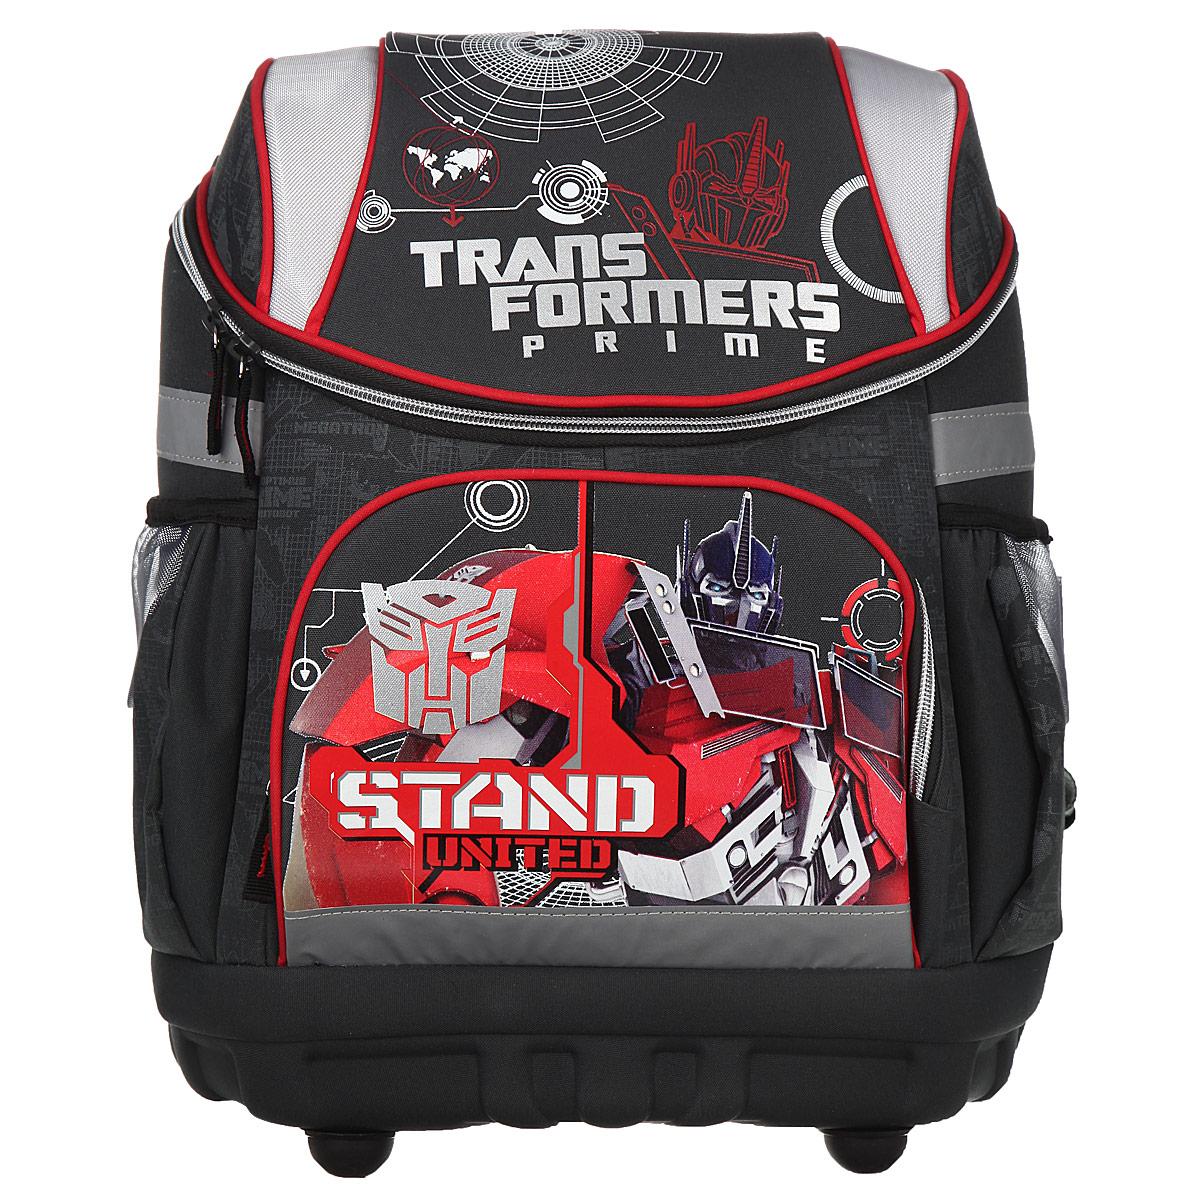 "Academy Style Рюкзак детский Академия Групп ""Transformers Prime"", цвет: серый, красный. TRAB-UT1-135"